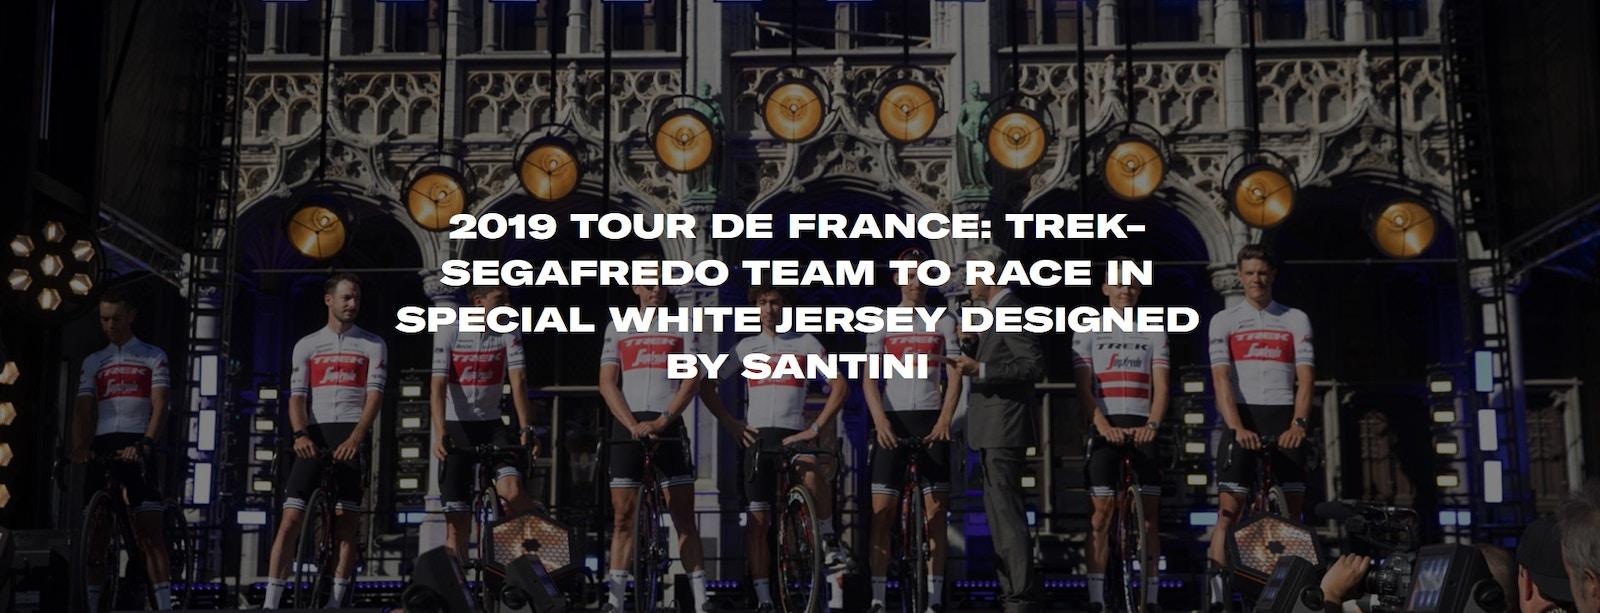 Santini - 2019 tour De France: Trek-Segafredo Team to race in special white jersey designed by Santini